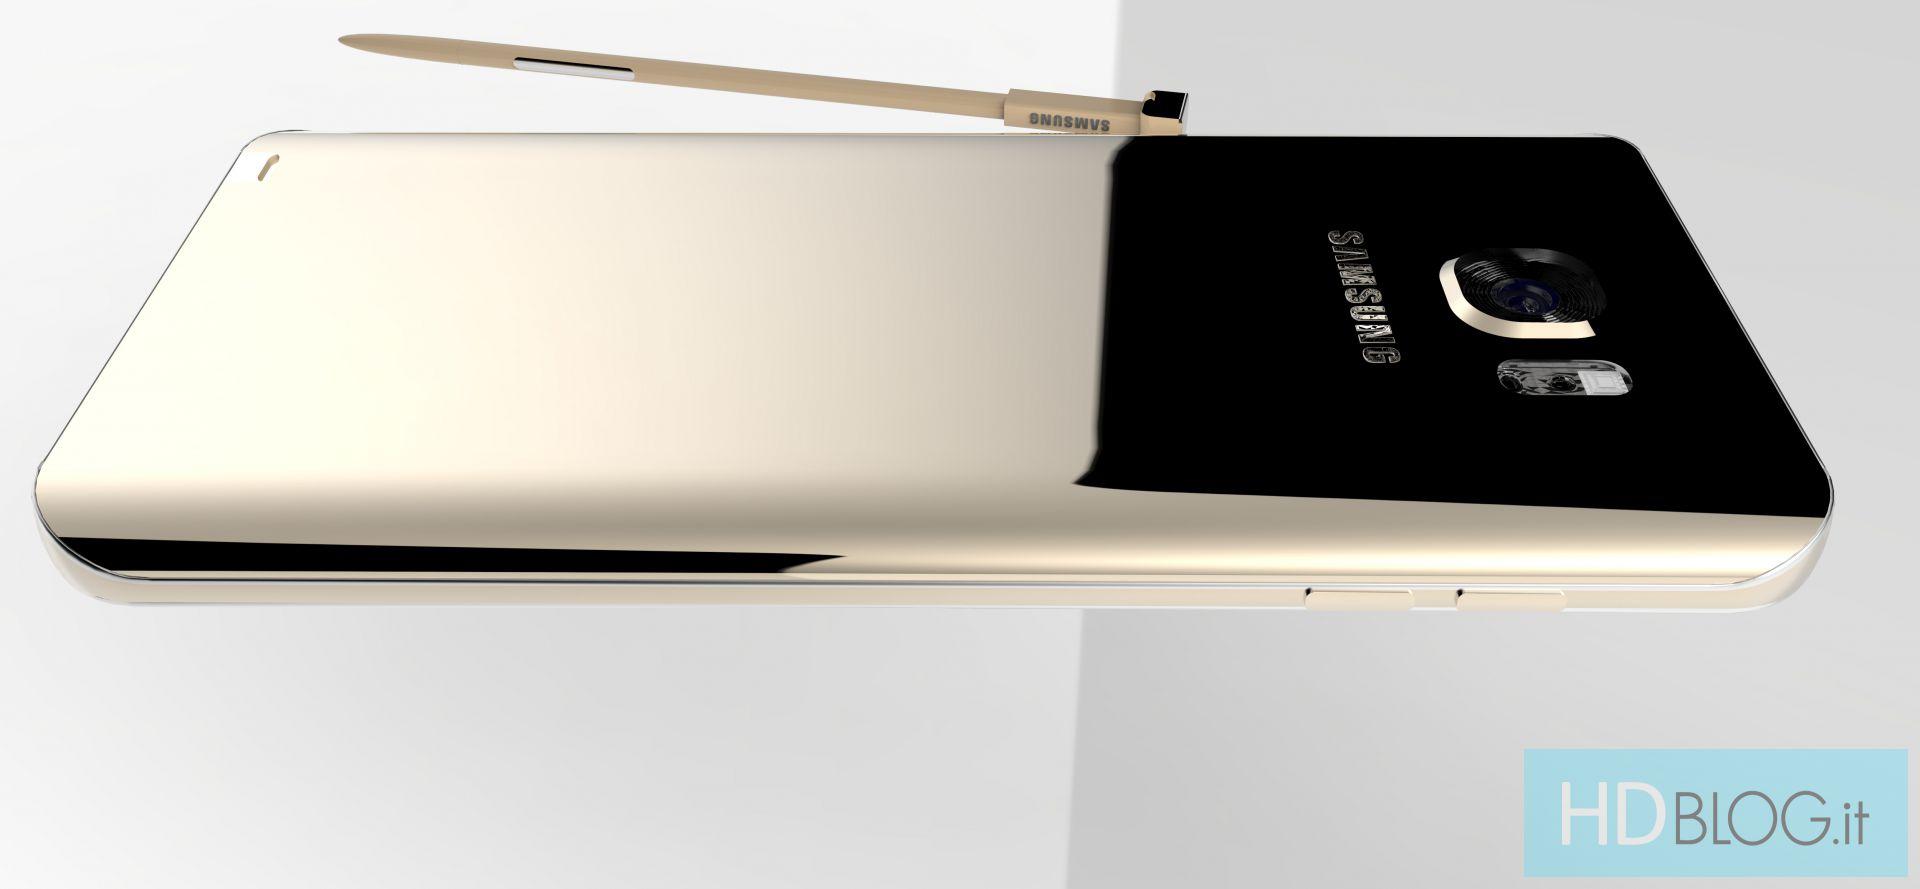 Galaxy-Note-5-schematics-and-concept-renders-19.jpg